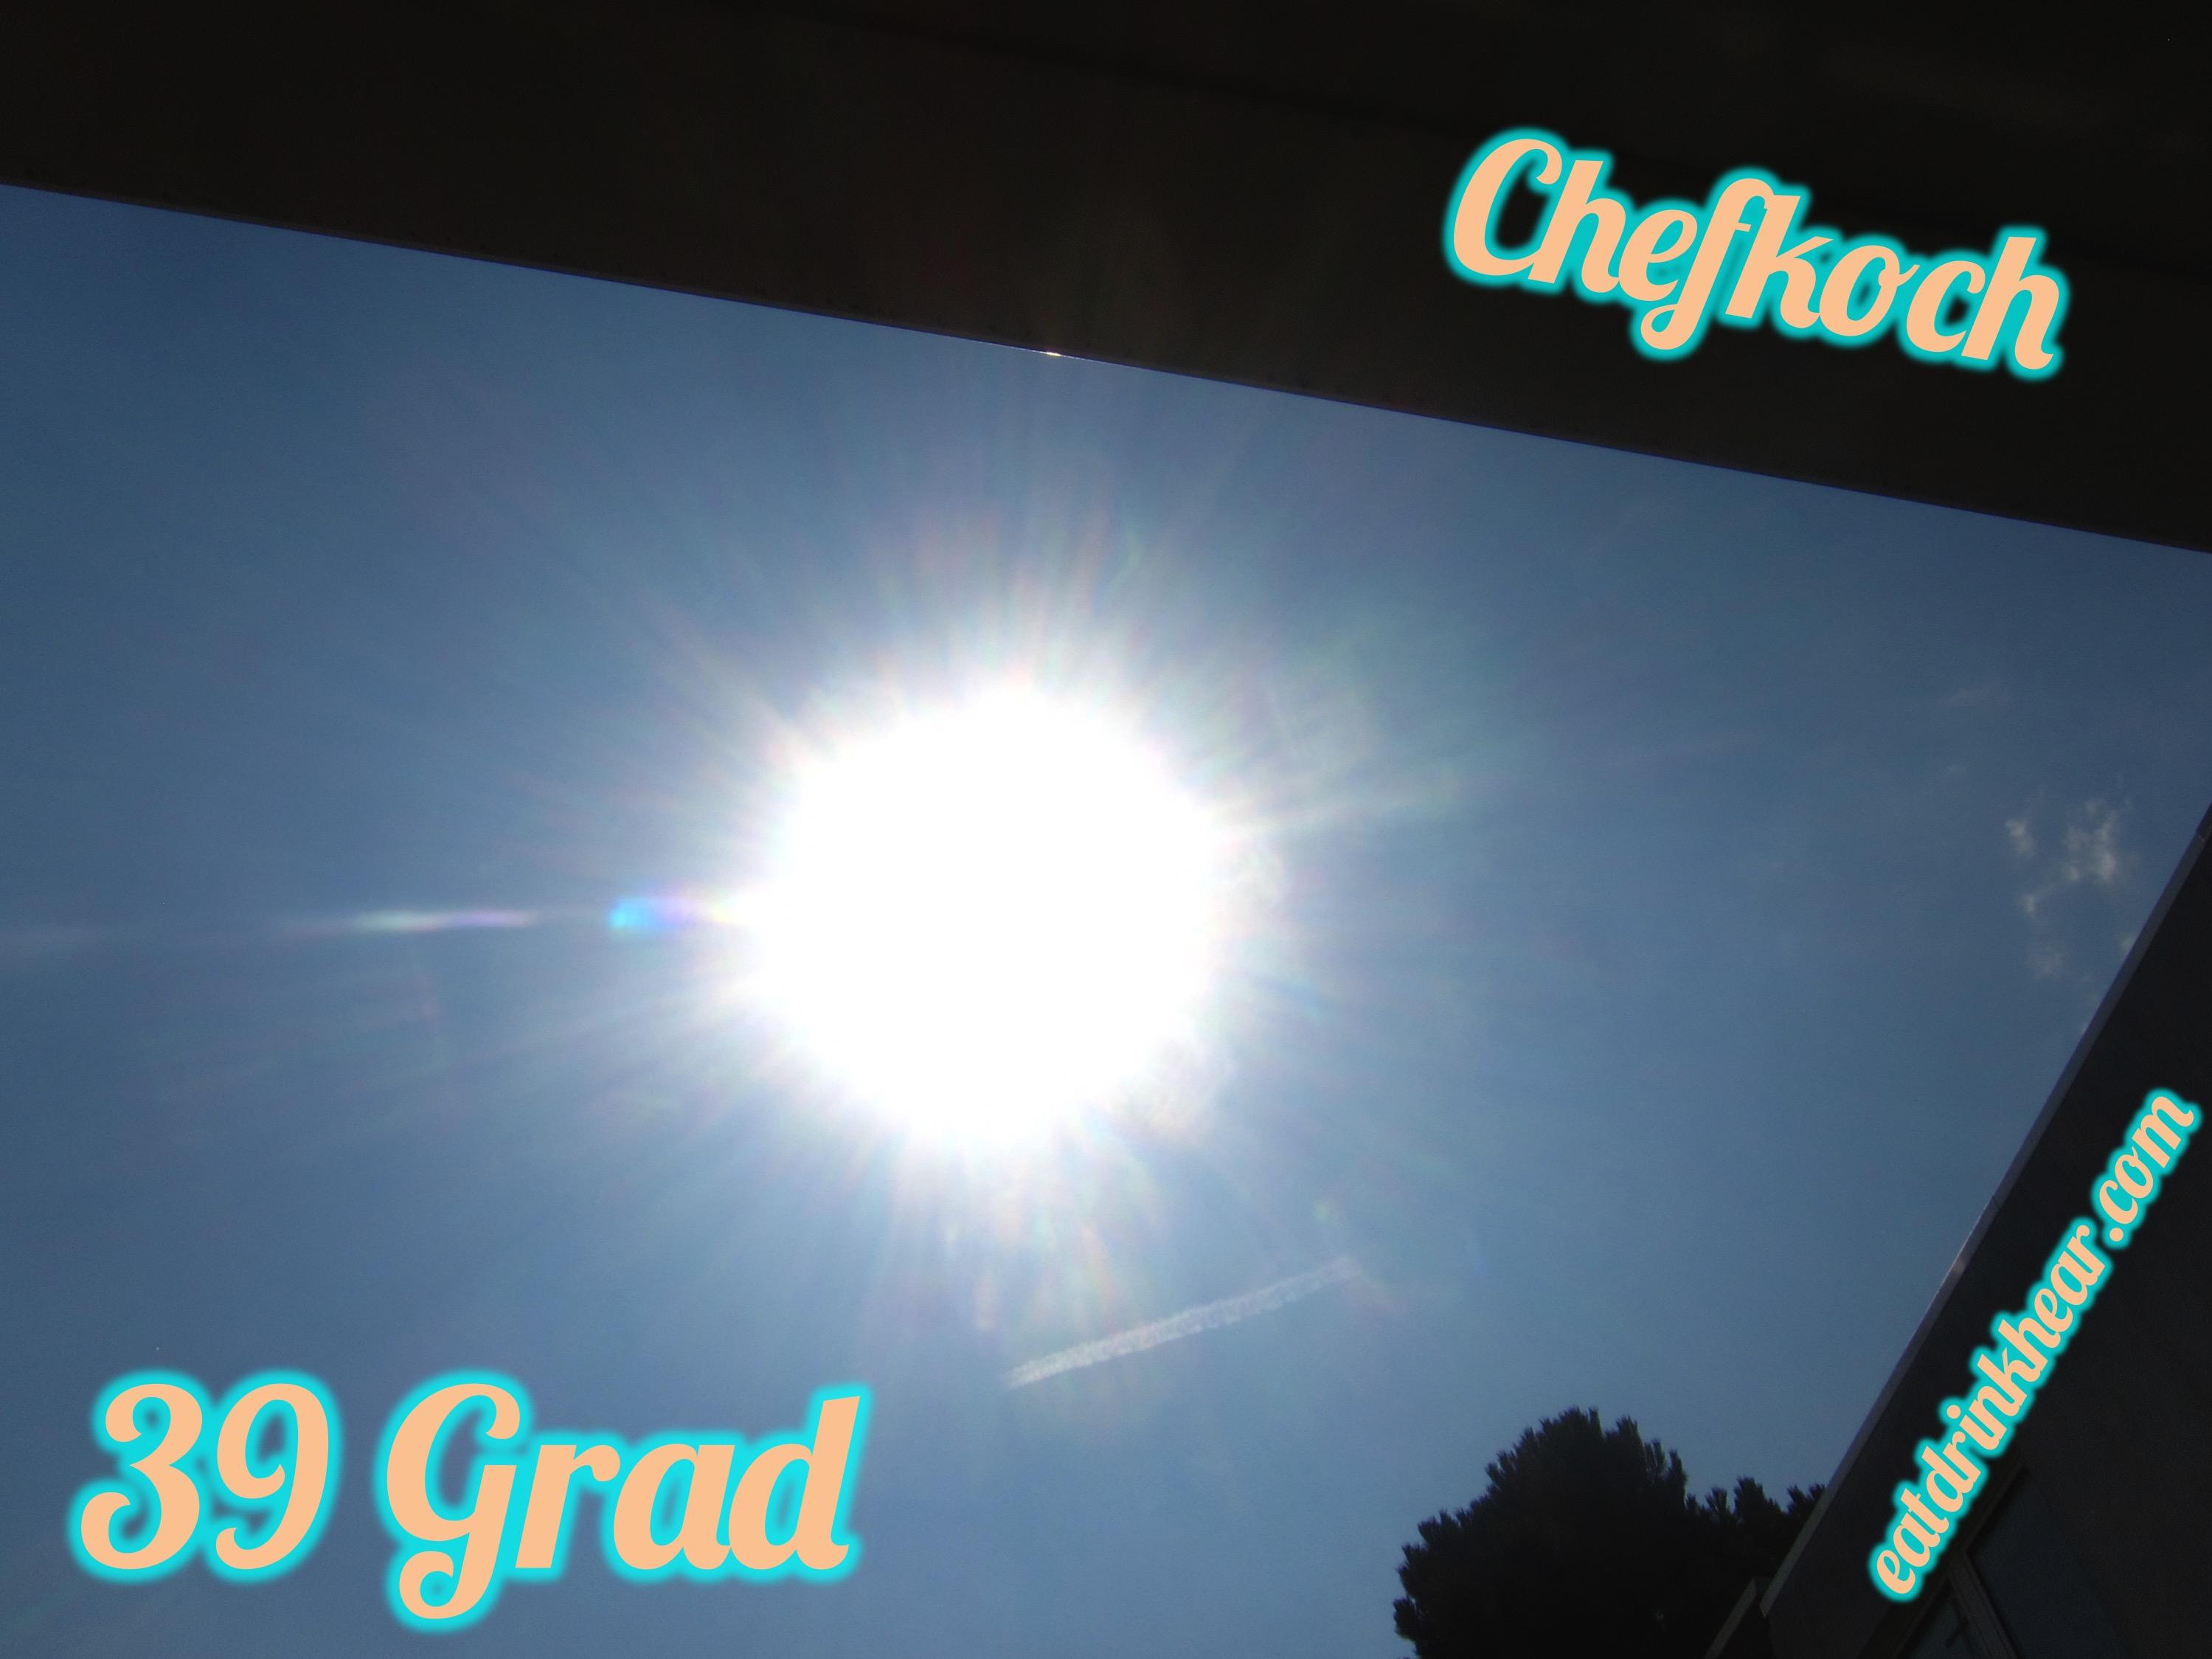 <!--:de-->39 °C – Chefkoch<!--:--><!--:en-->39 °C (102.2 °F) – Chefkoch<!--:-->